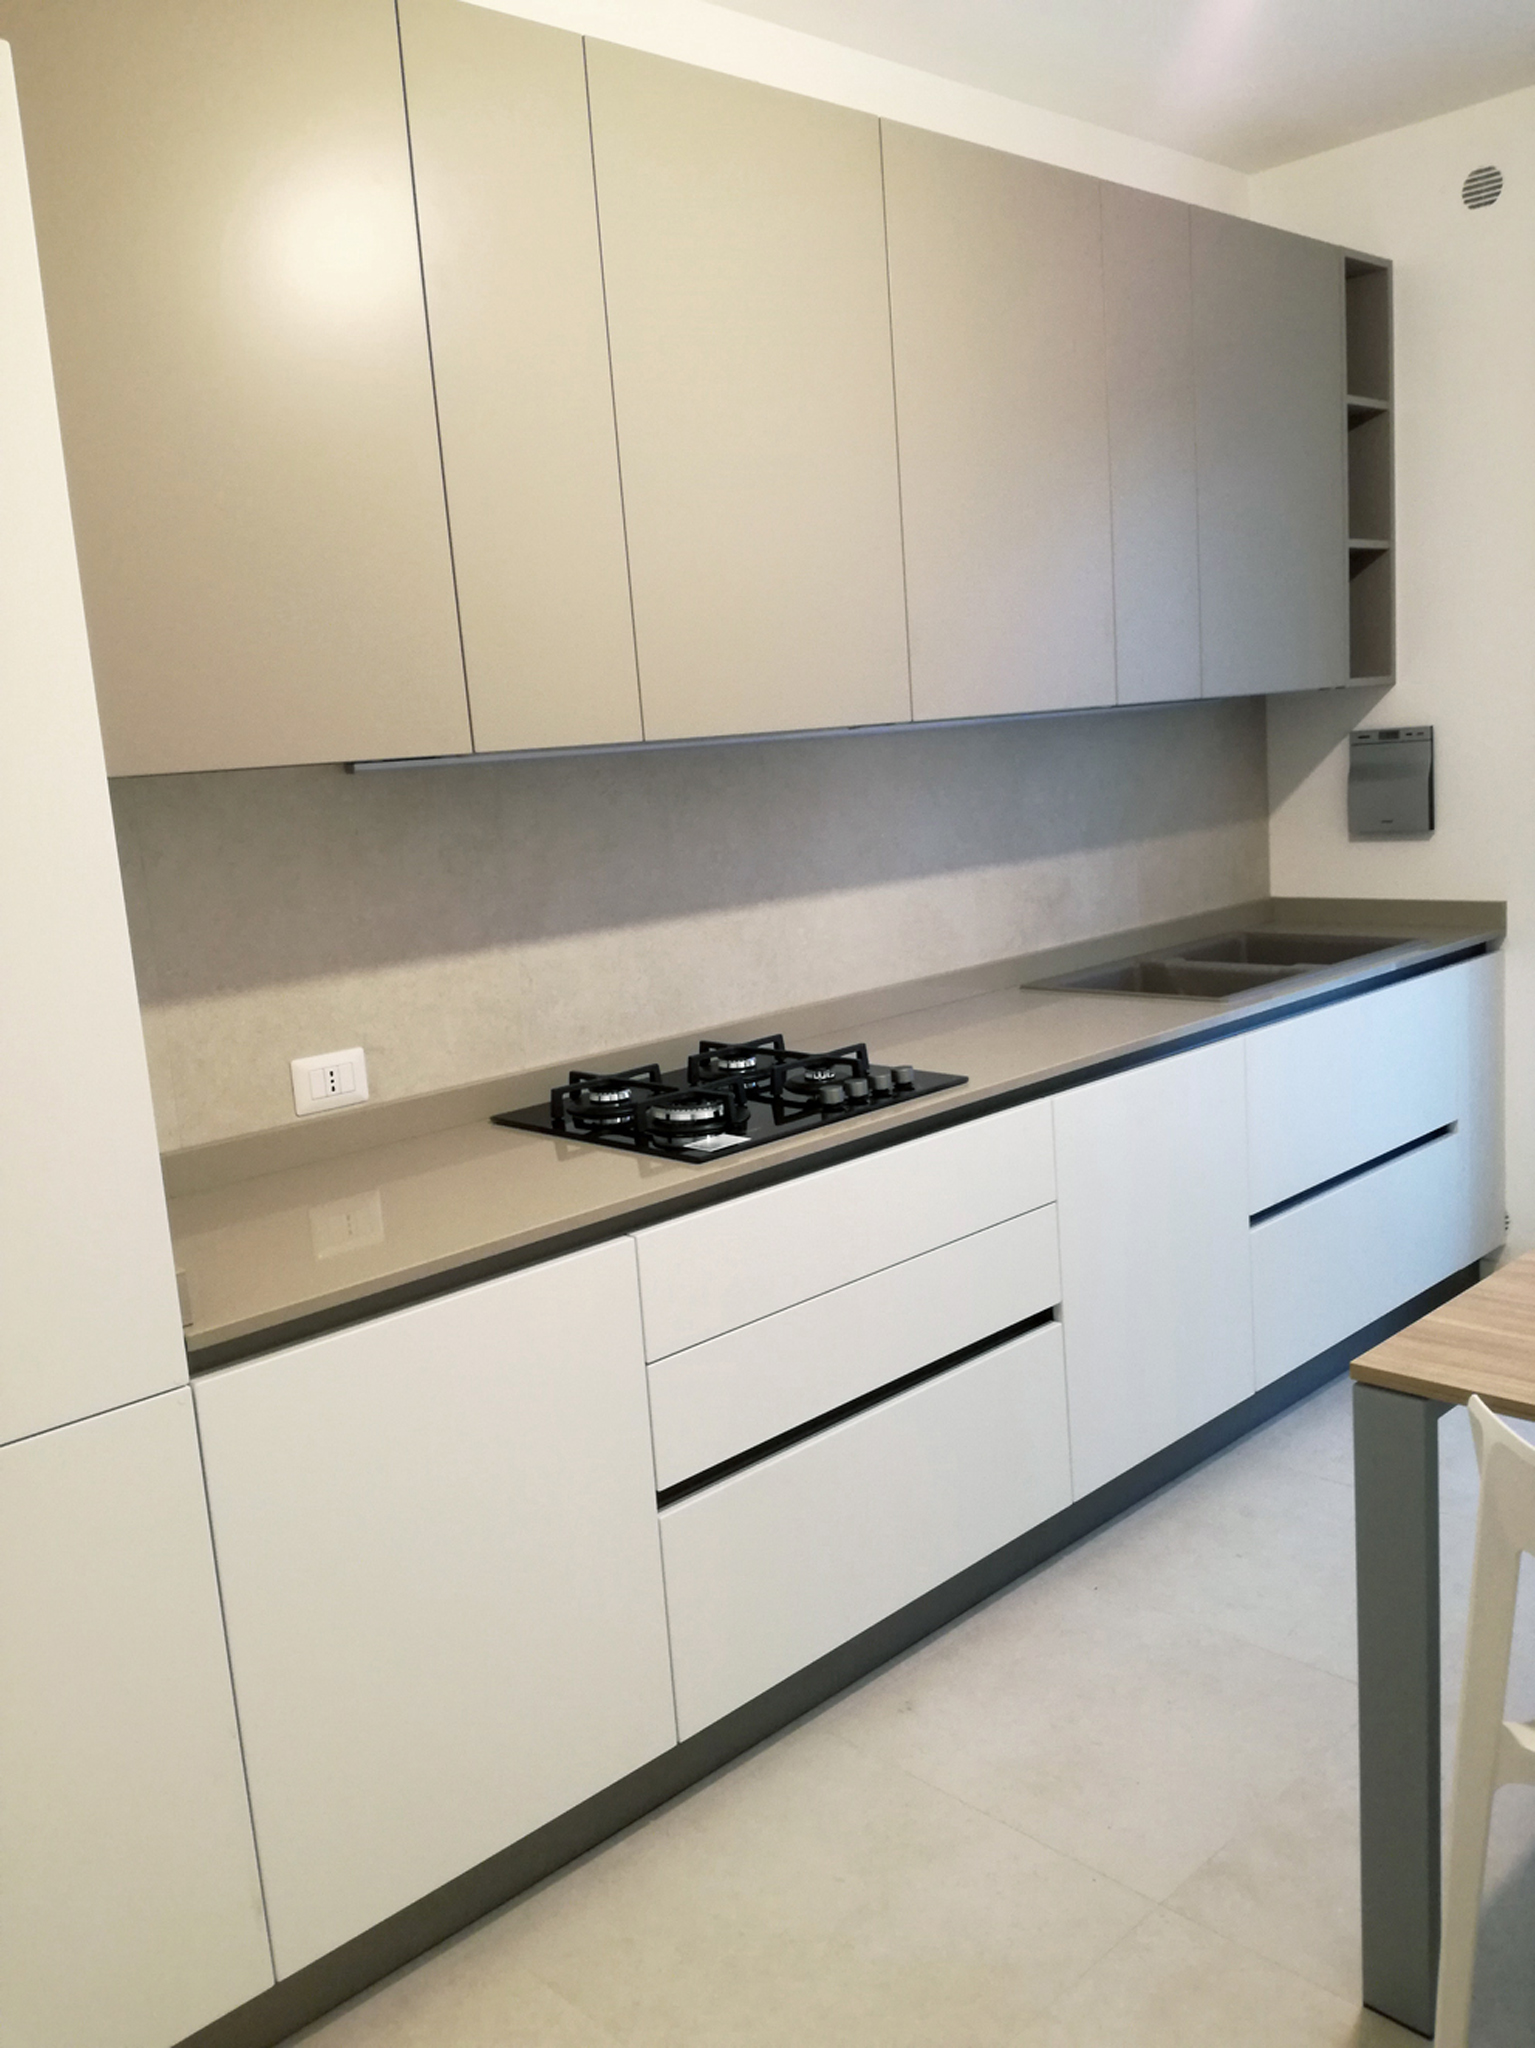 Cucina smart bianco opaco e grigio tortora arredamenti barin for Arredamento bianco e tortora